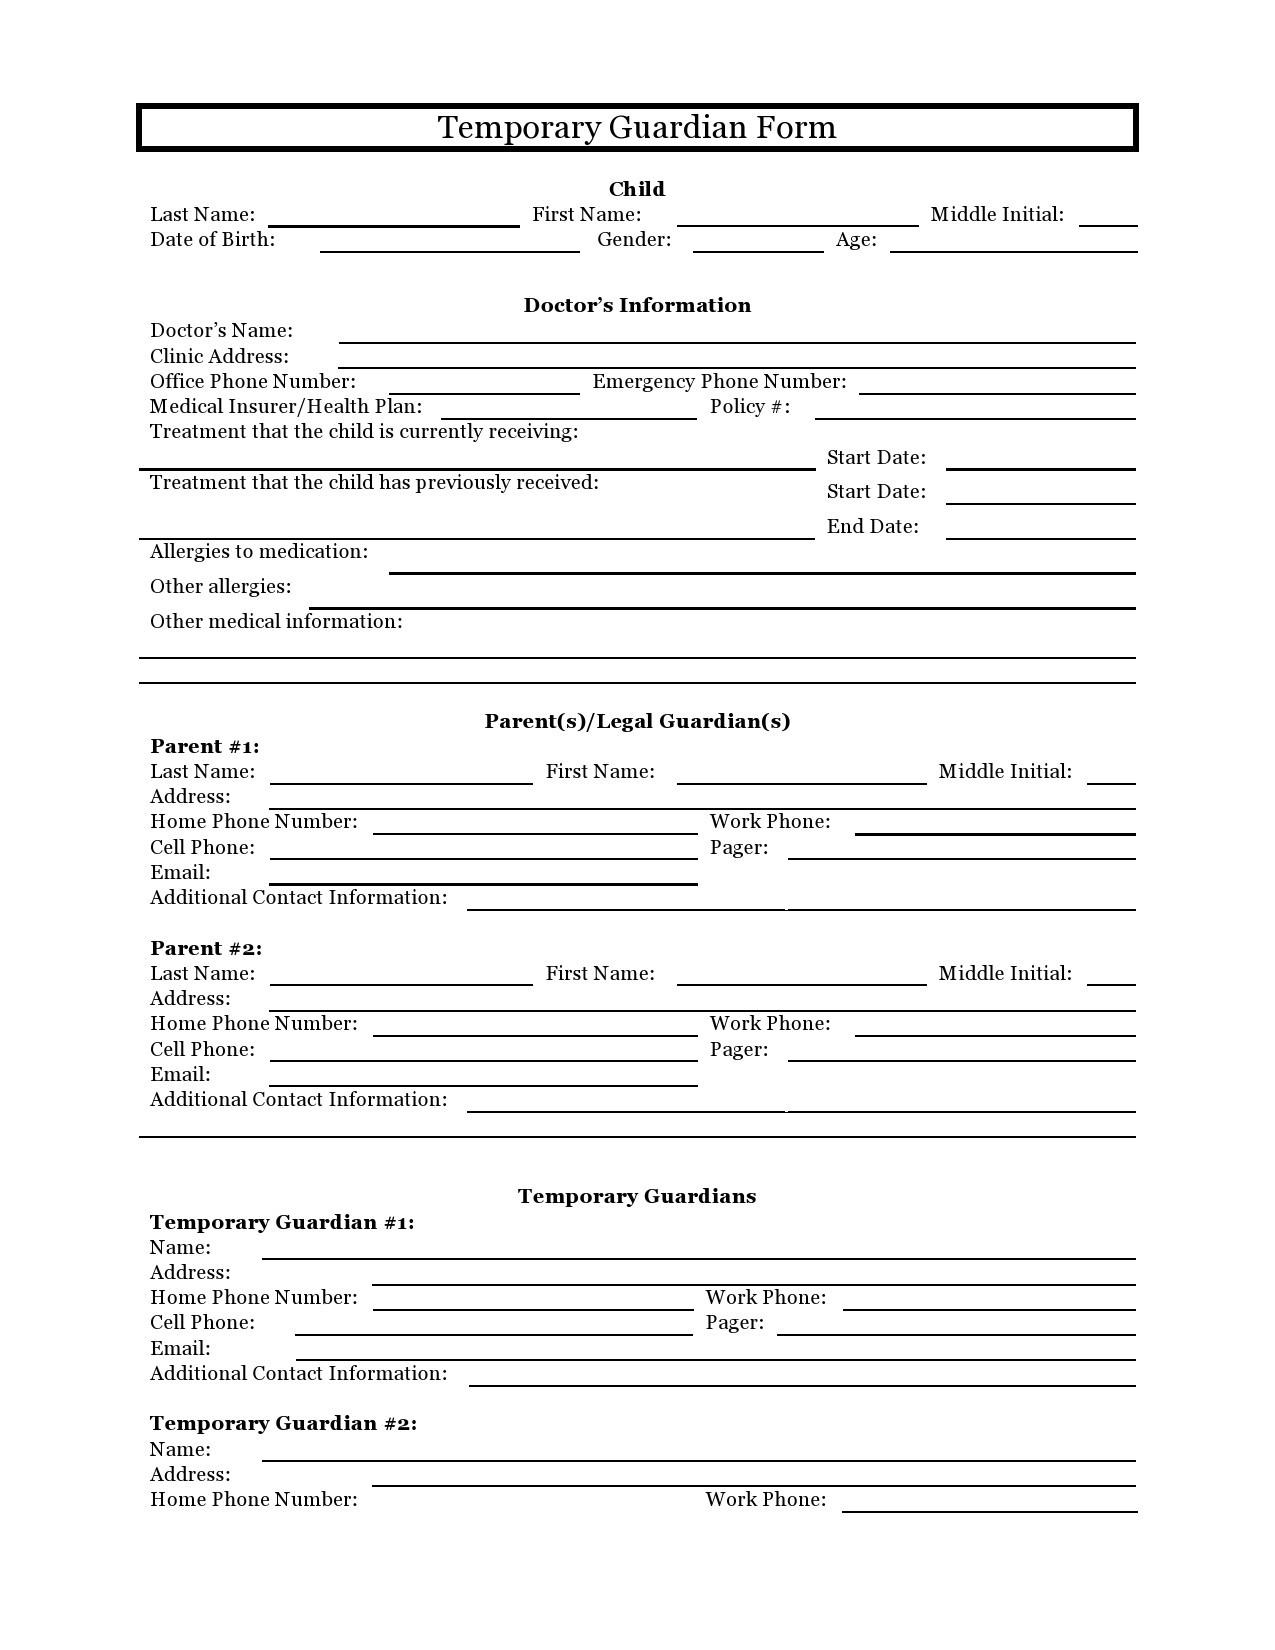 Free guardianship form 09